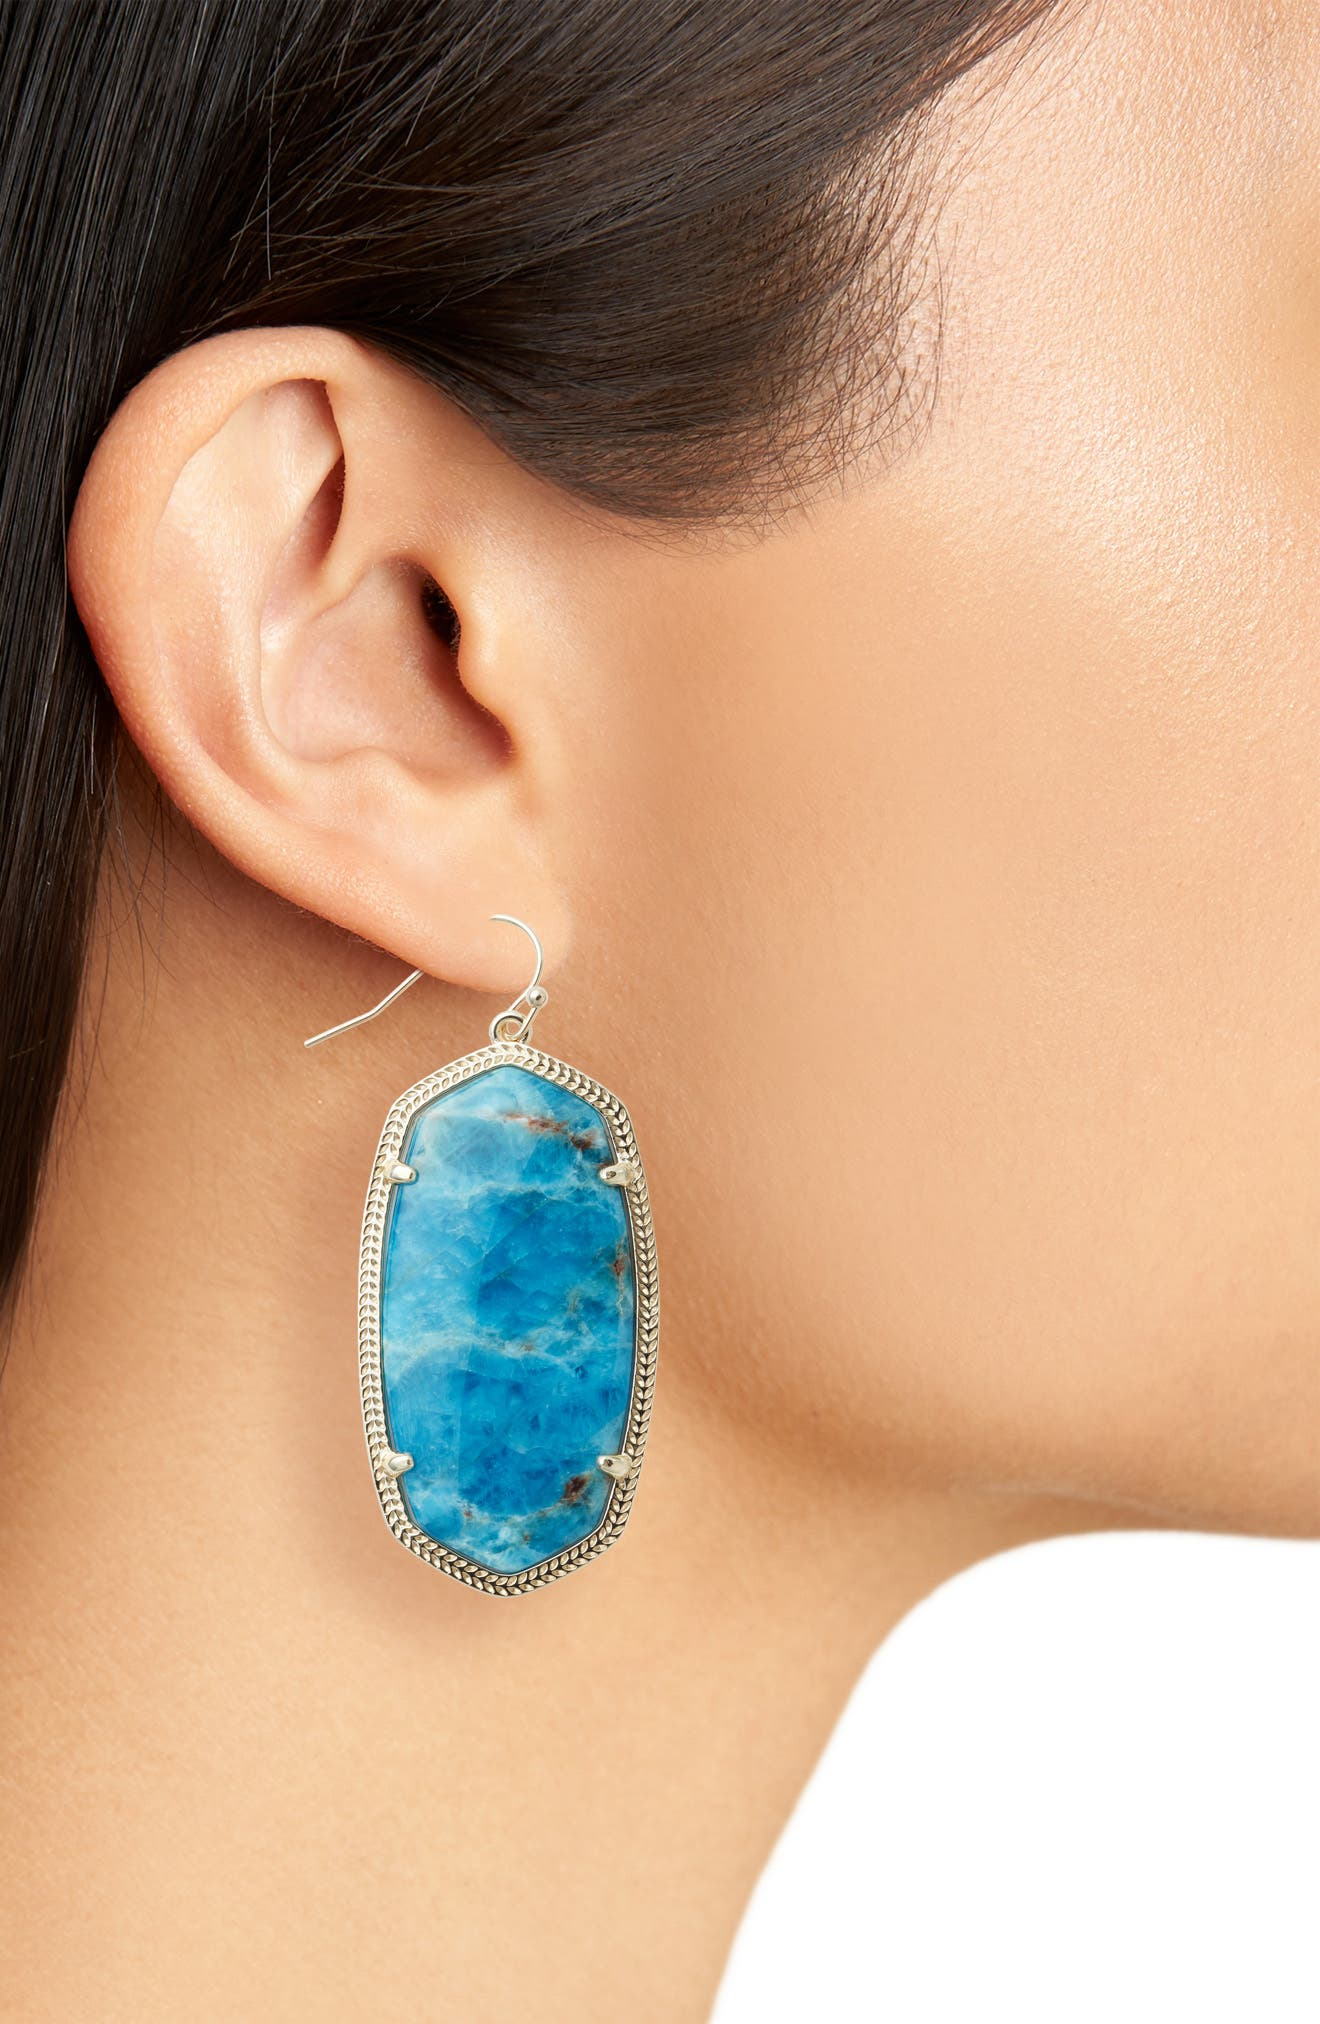 Danielle - Large Oval Statement Earrings,                             Alternate thumbnail 2, color,                             Aqua Apatite/ Brass